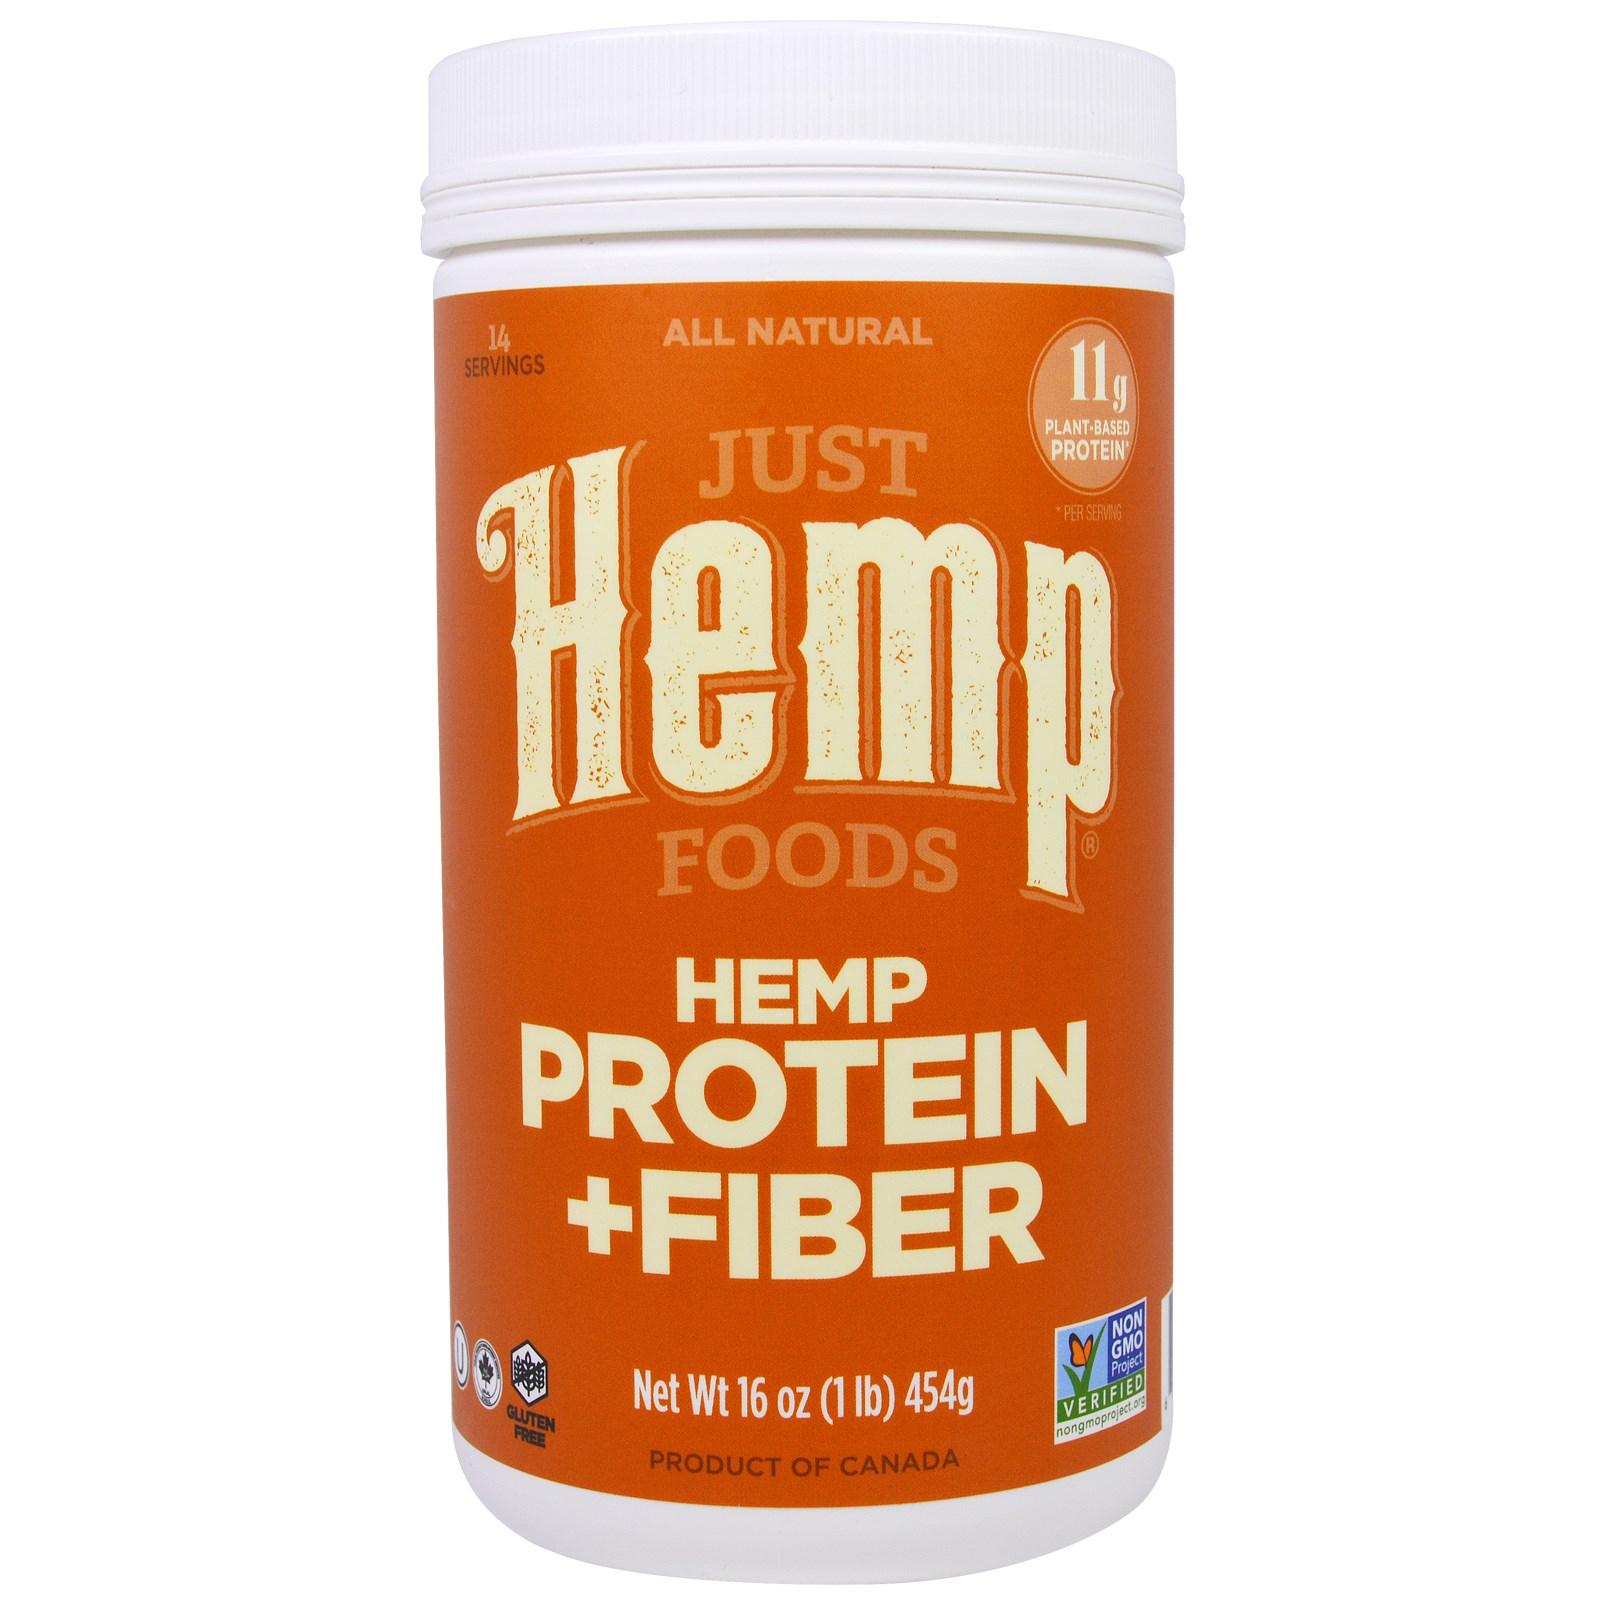 Just Hemp Foods, Конопляный Белок + Волокно, 16 унций (454 г)